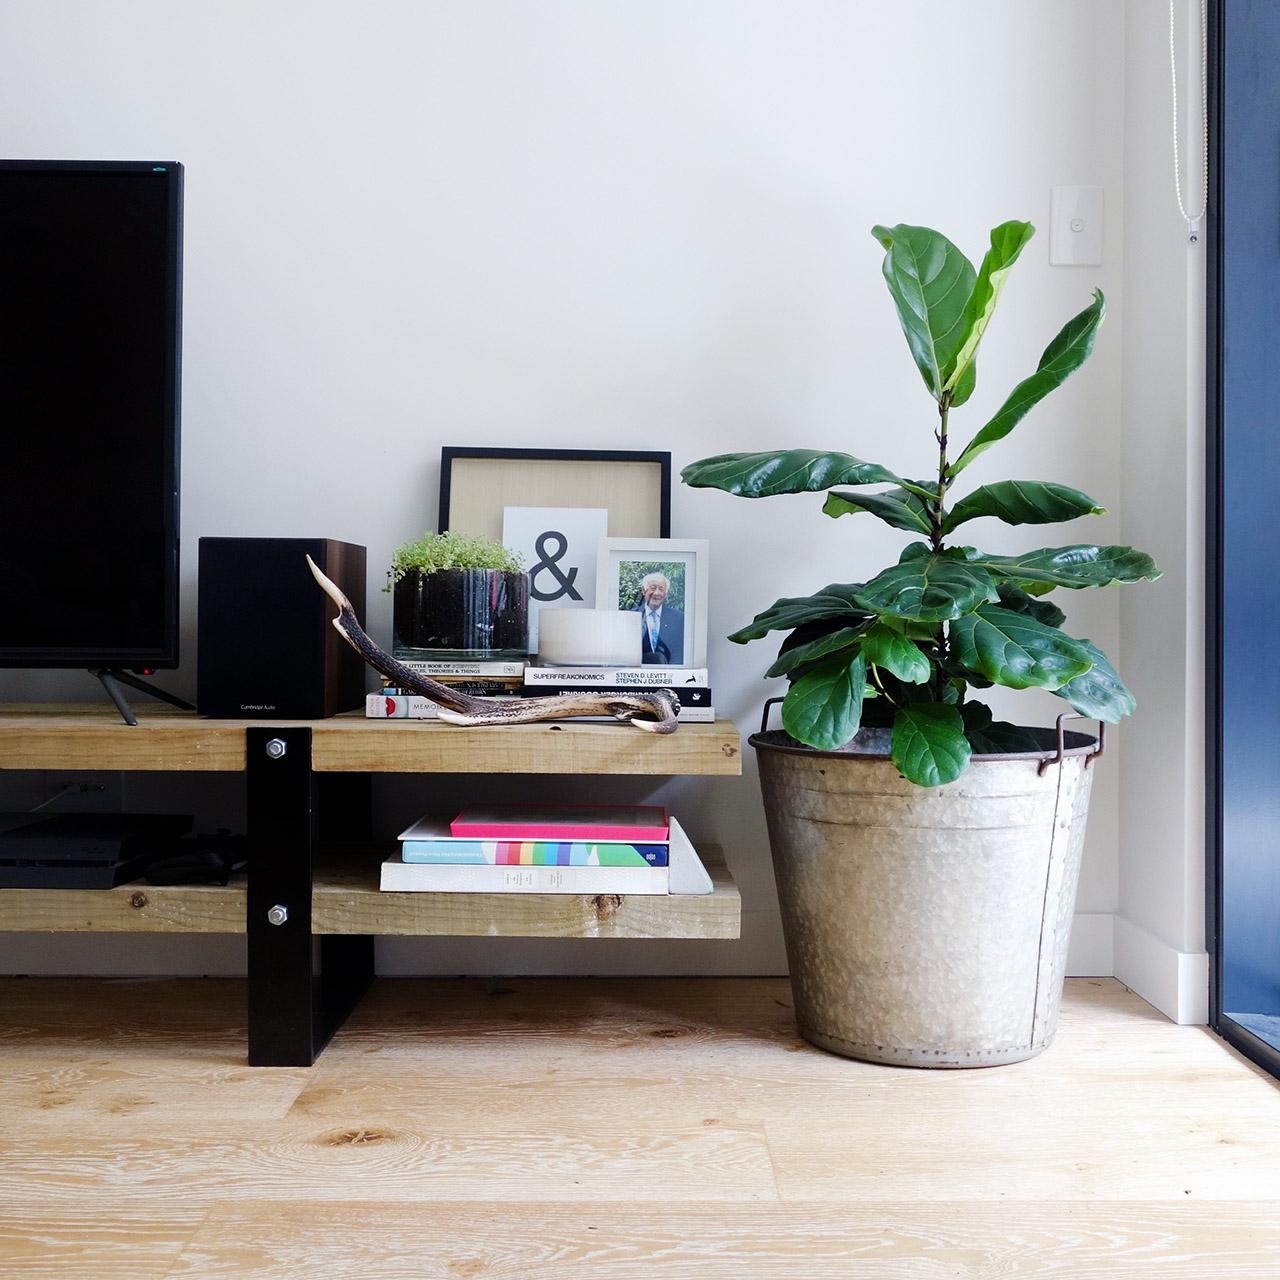 surry-hills-sydney-luxury-apartment-lounge-diy-steel-wood-tv-cabinet-fiddle-fig-leaf-tree-01